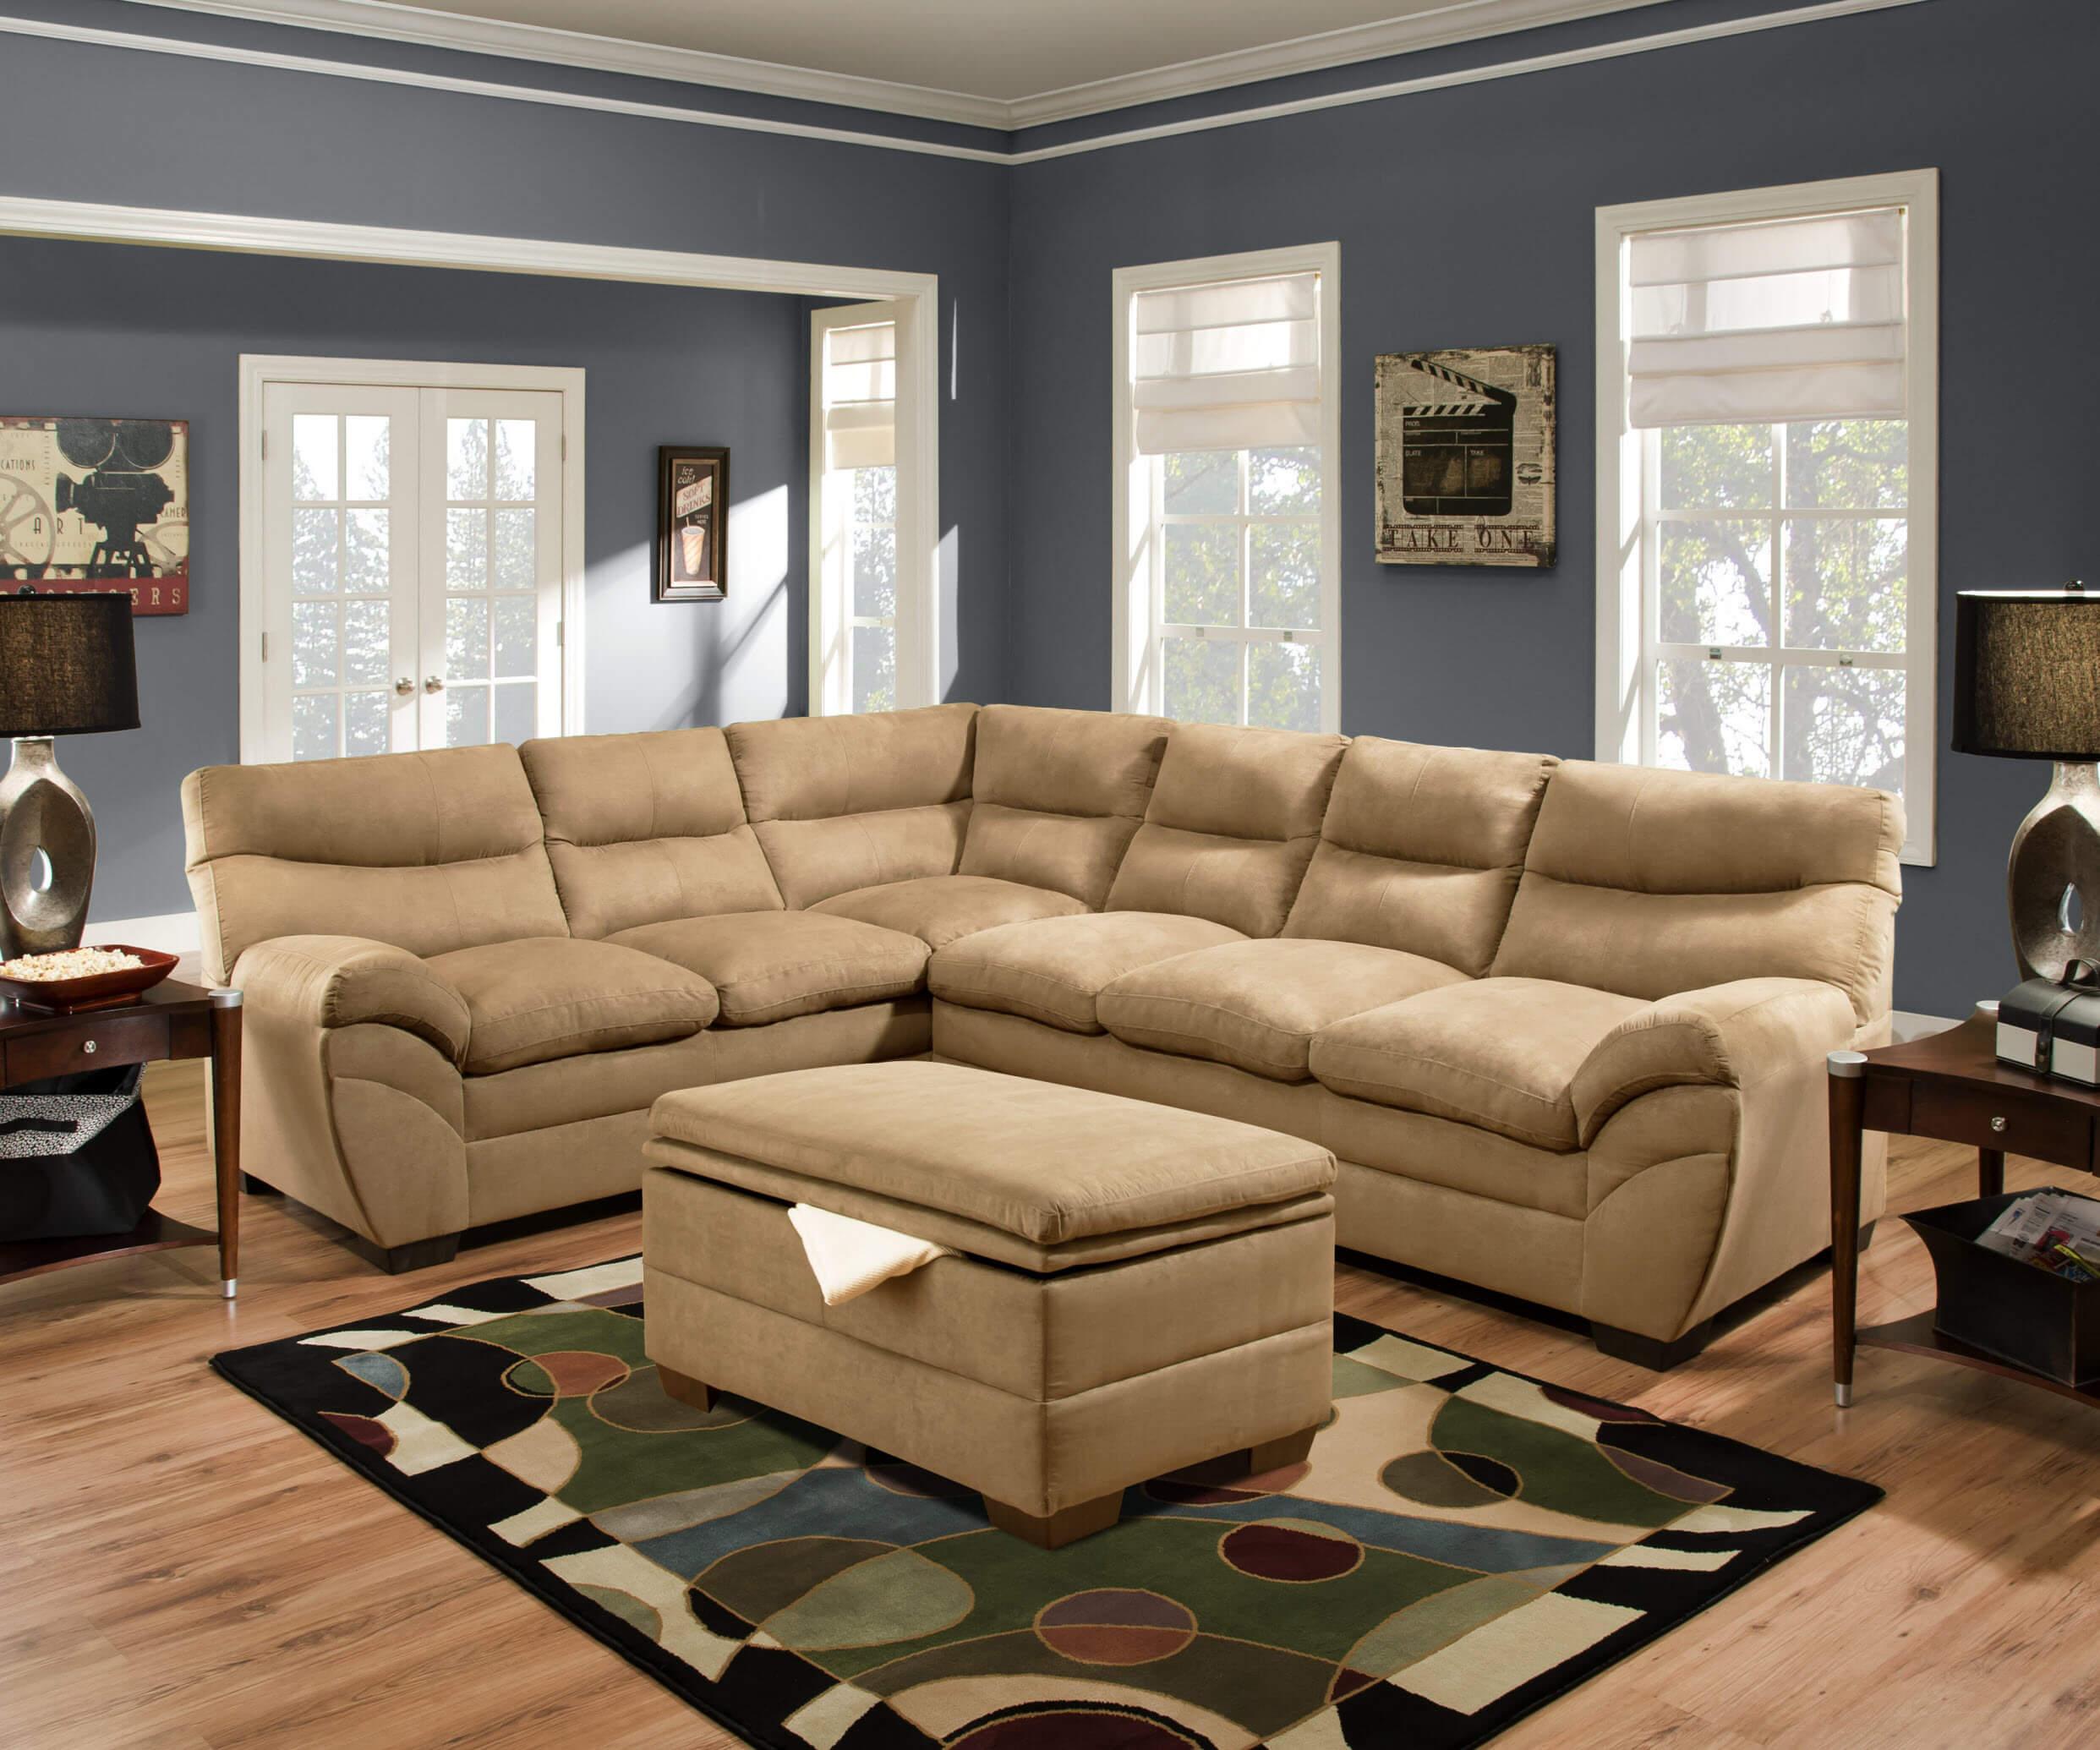 Simmon Luna Latte Sectional Sectional Sofa Sets